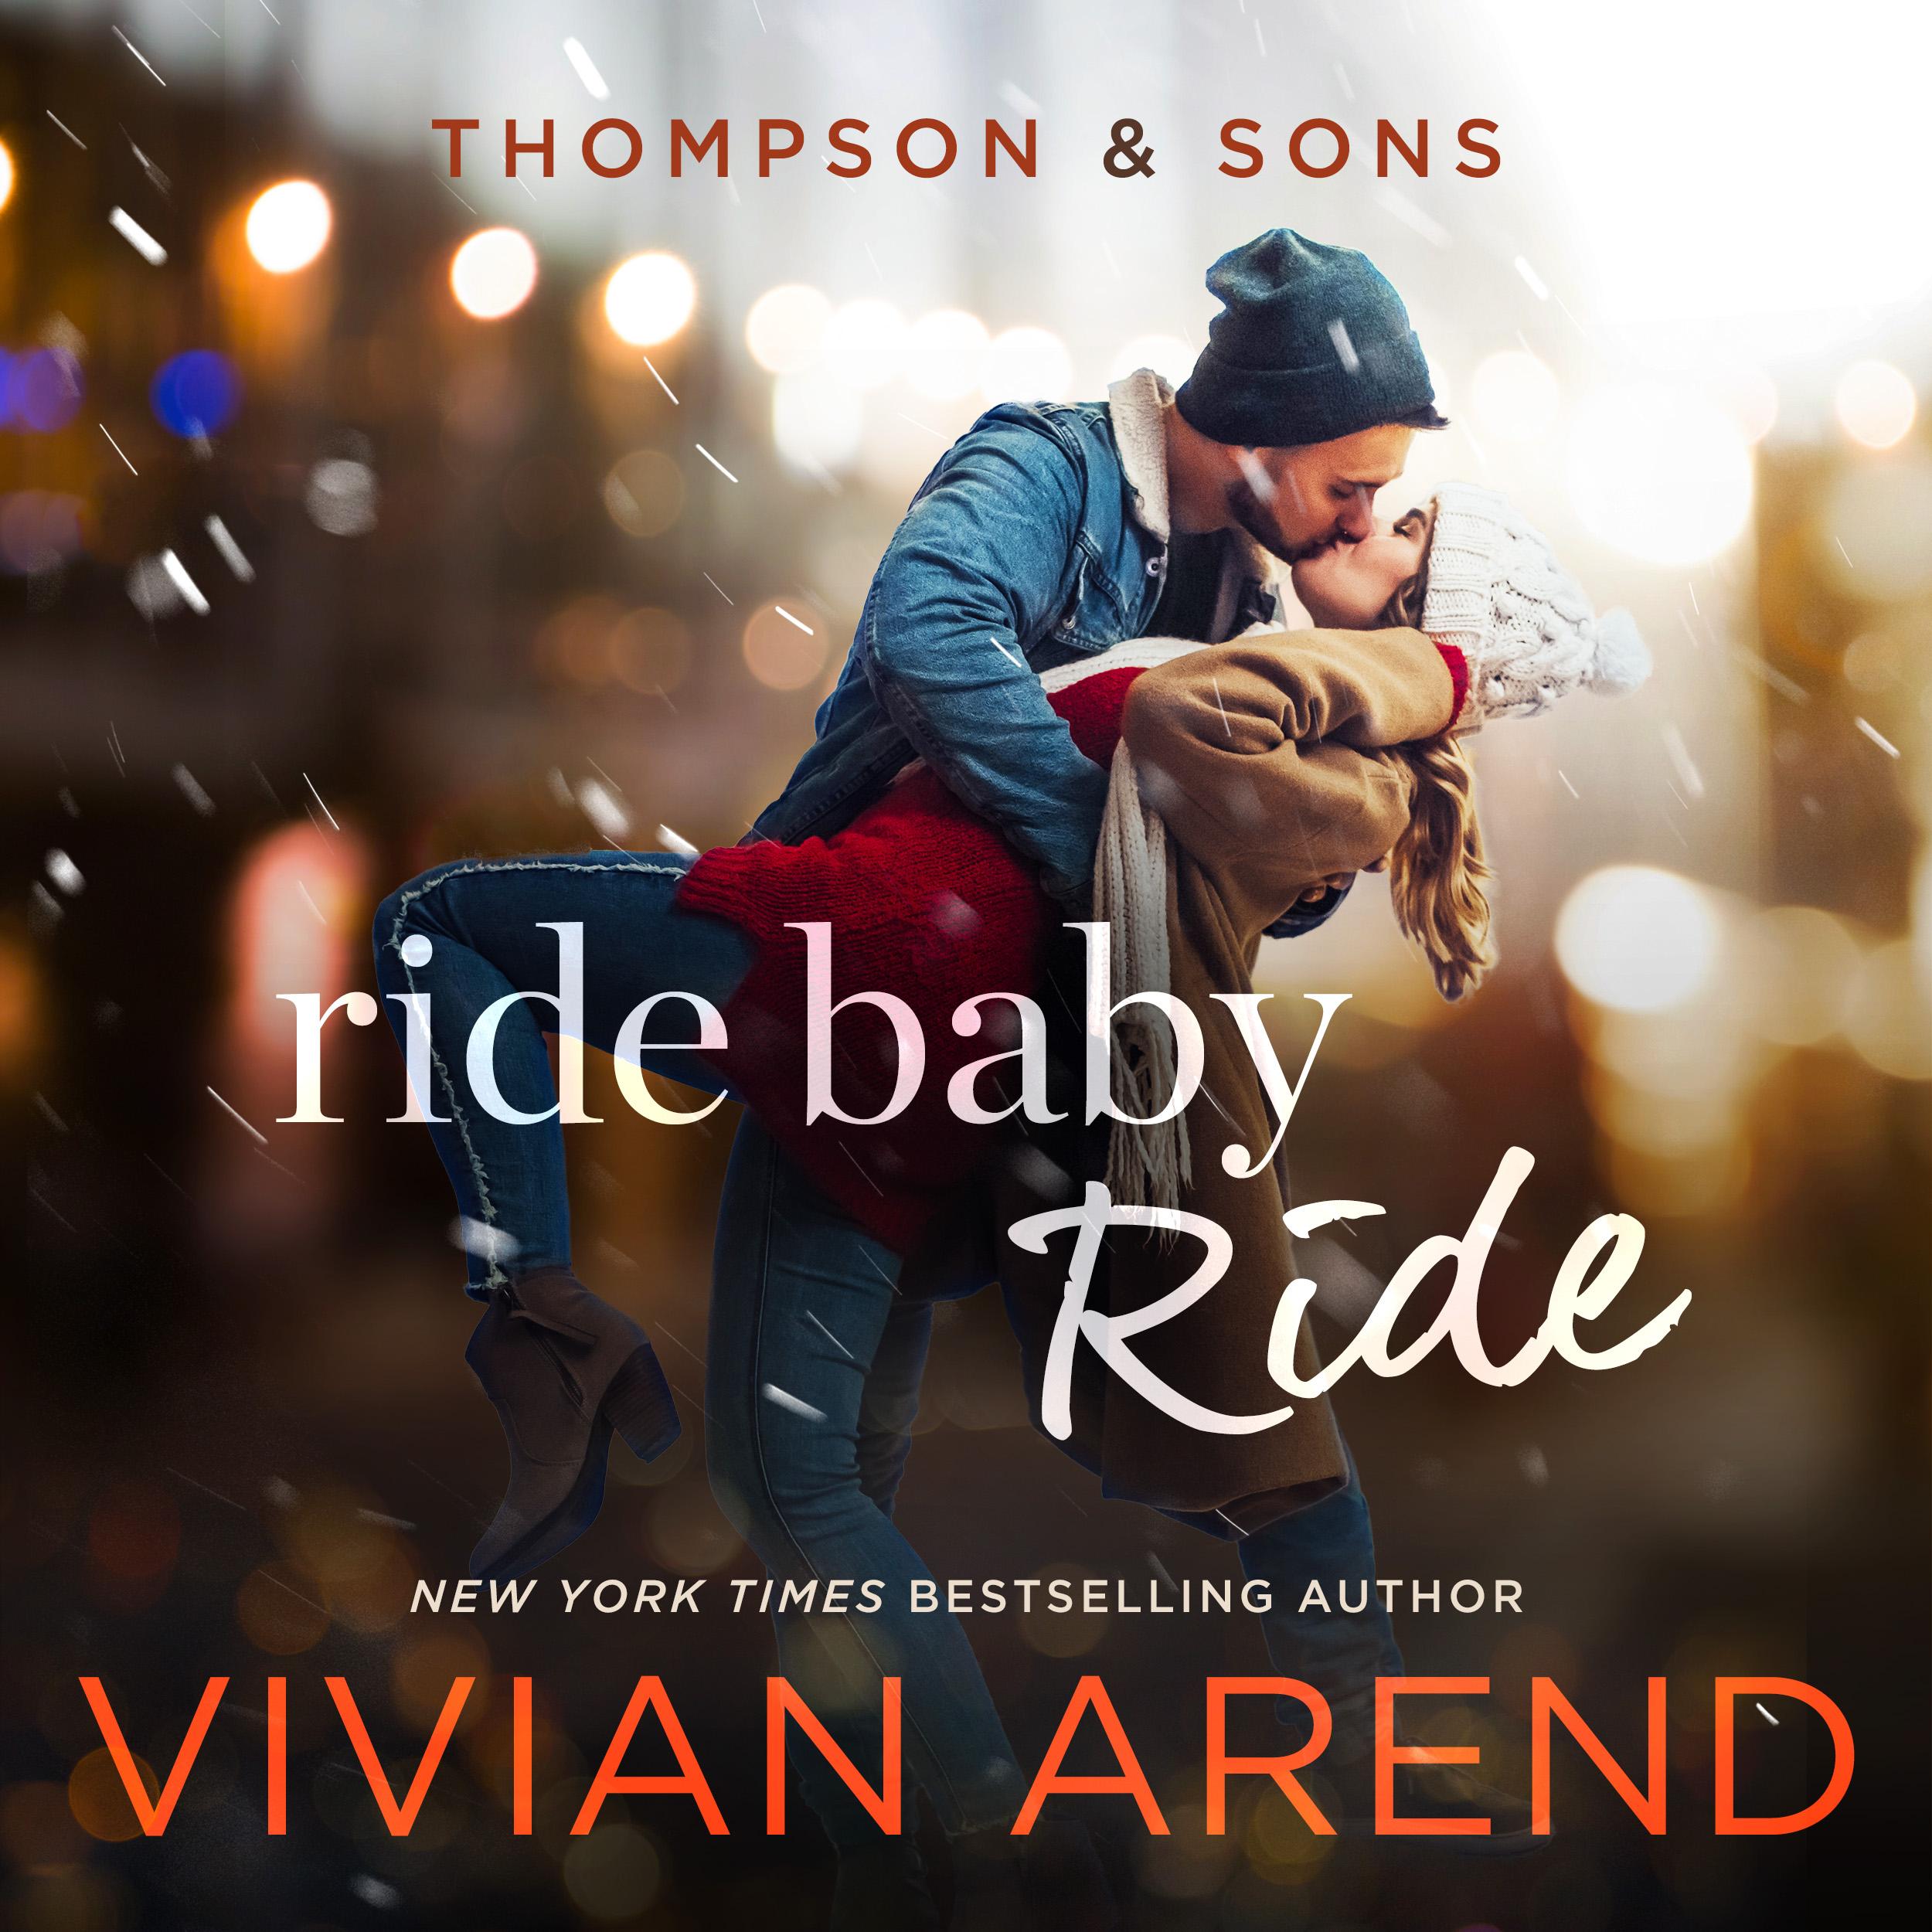 Ride Baby Ride audiobook by Vivian Arend